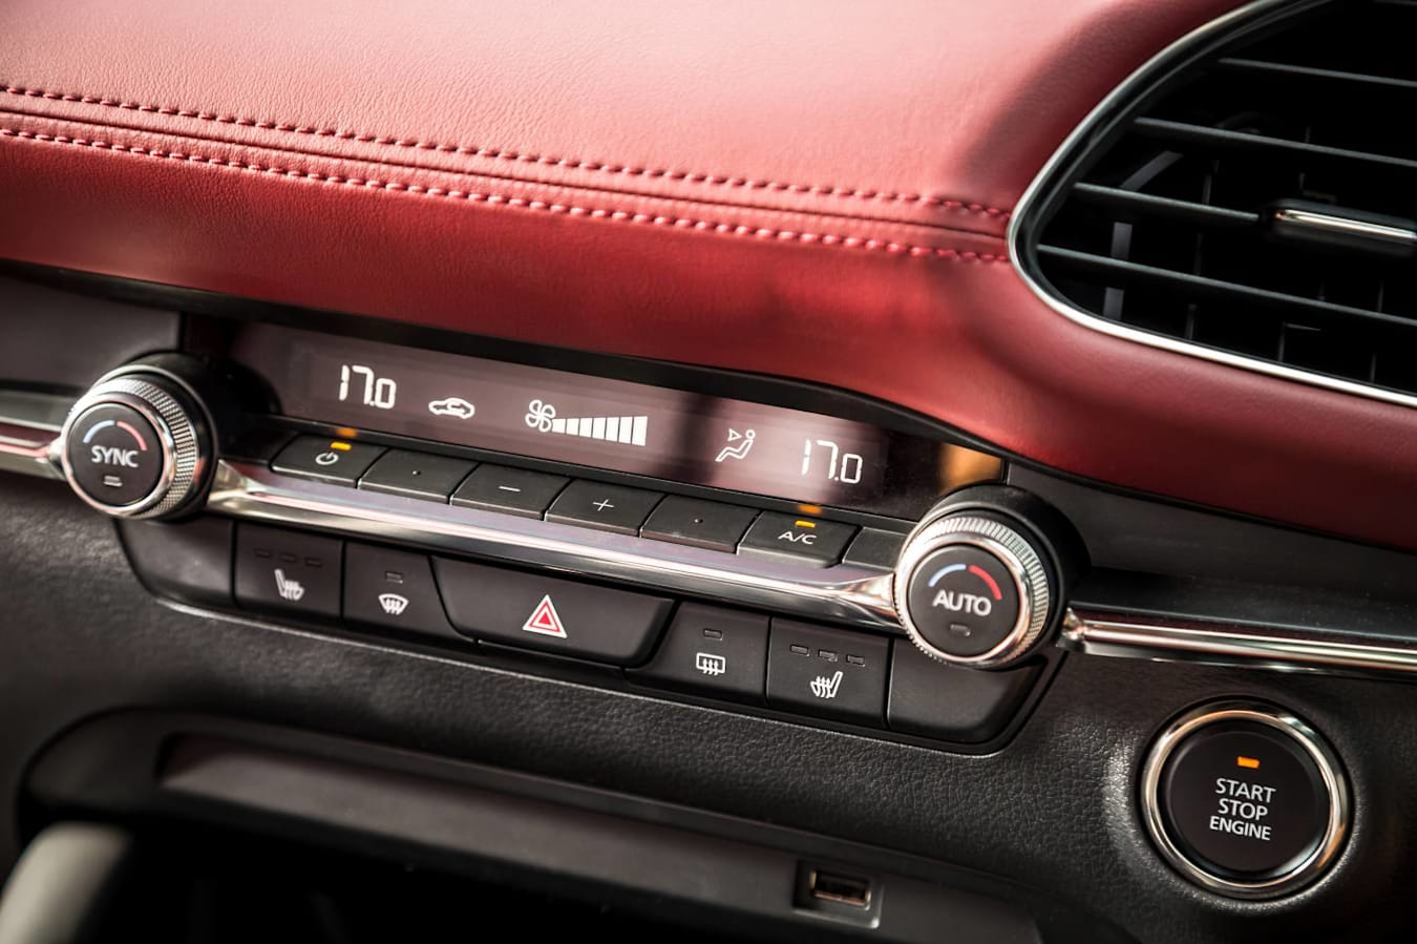 2019 Mazda 3 Astina Interior Hvac Detail Jpg